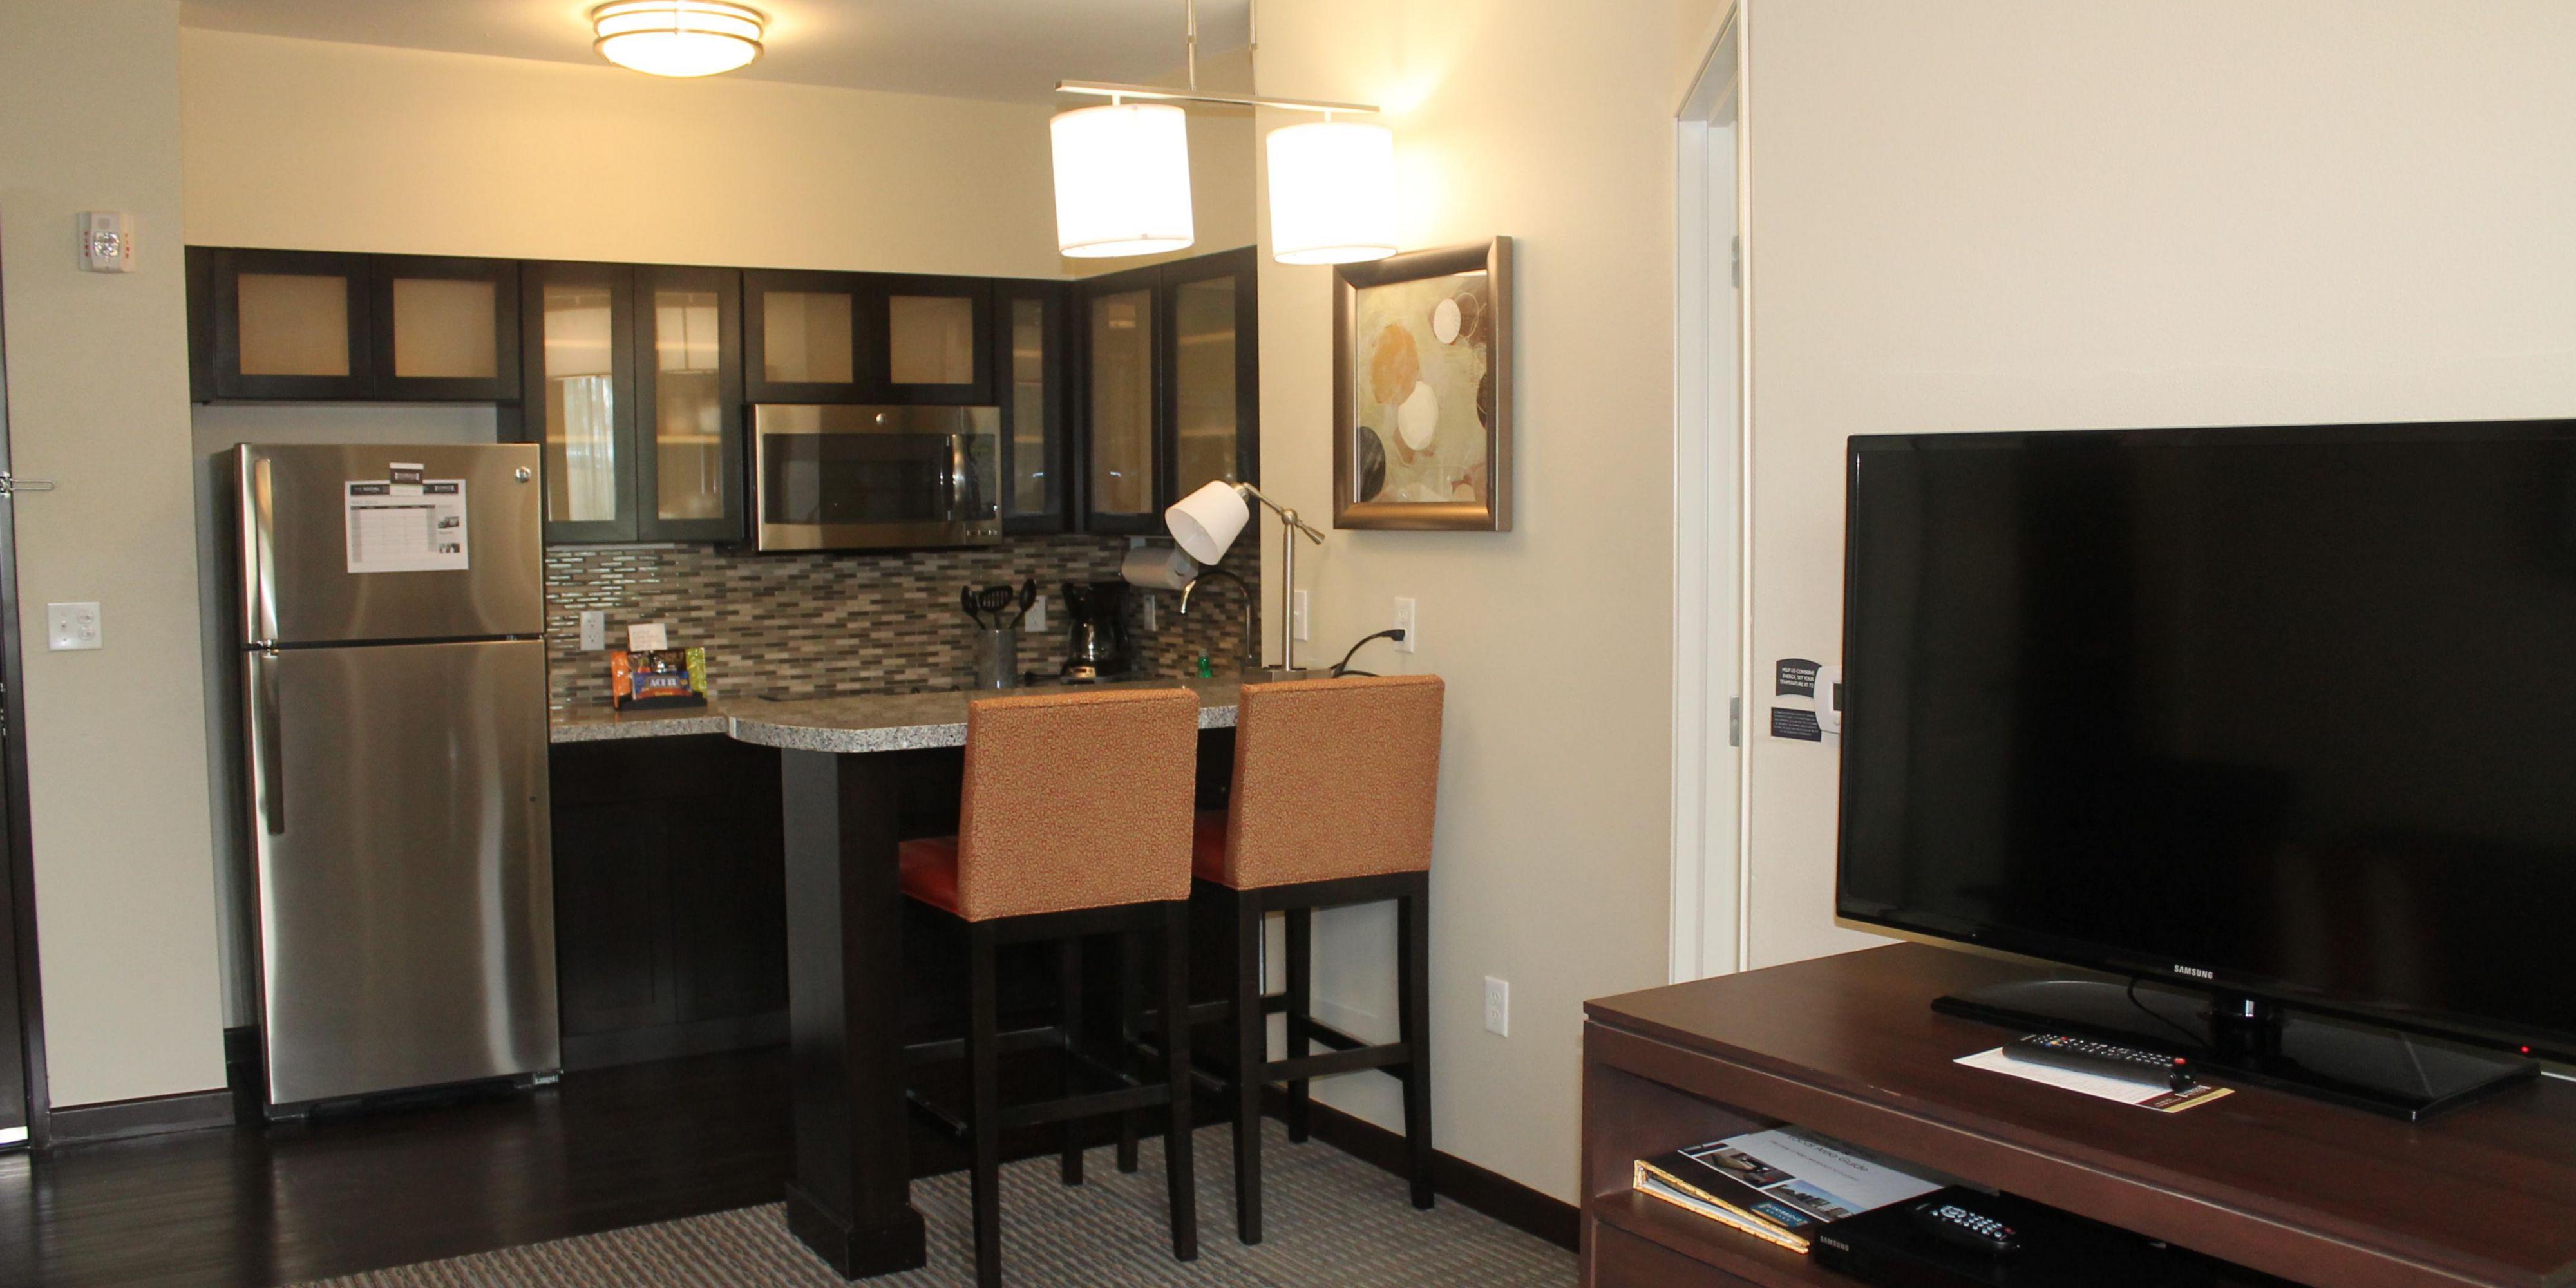 Staybridge Suites Carlsbad - San Diego image 1